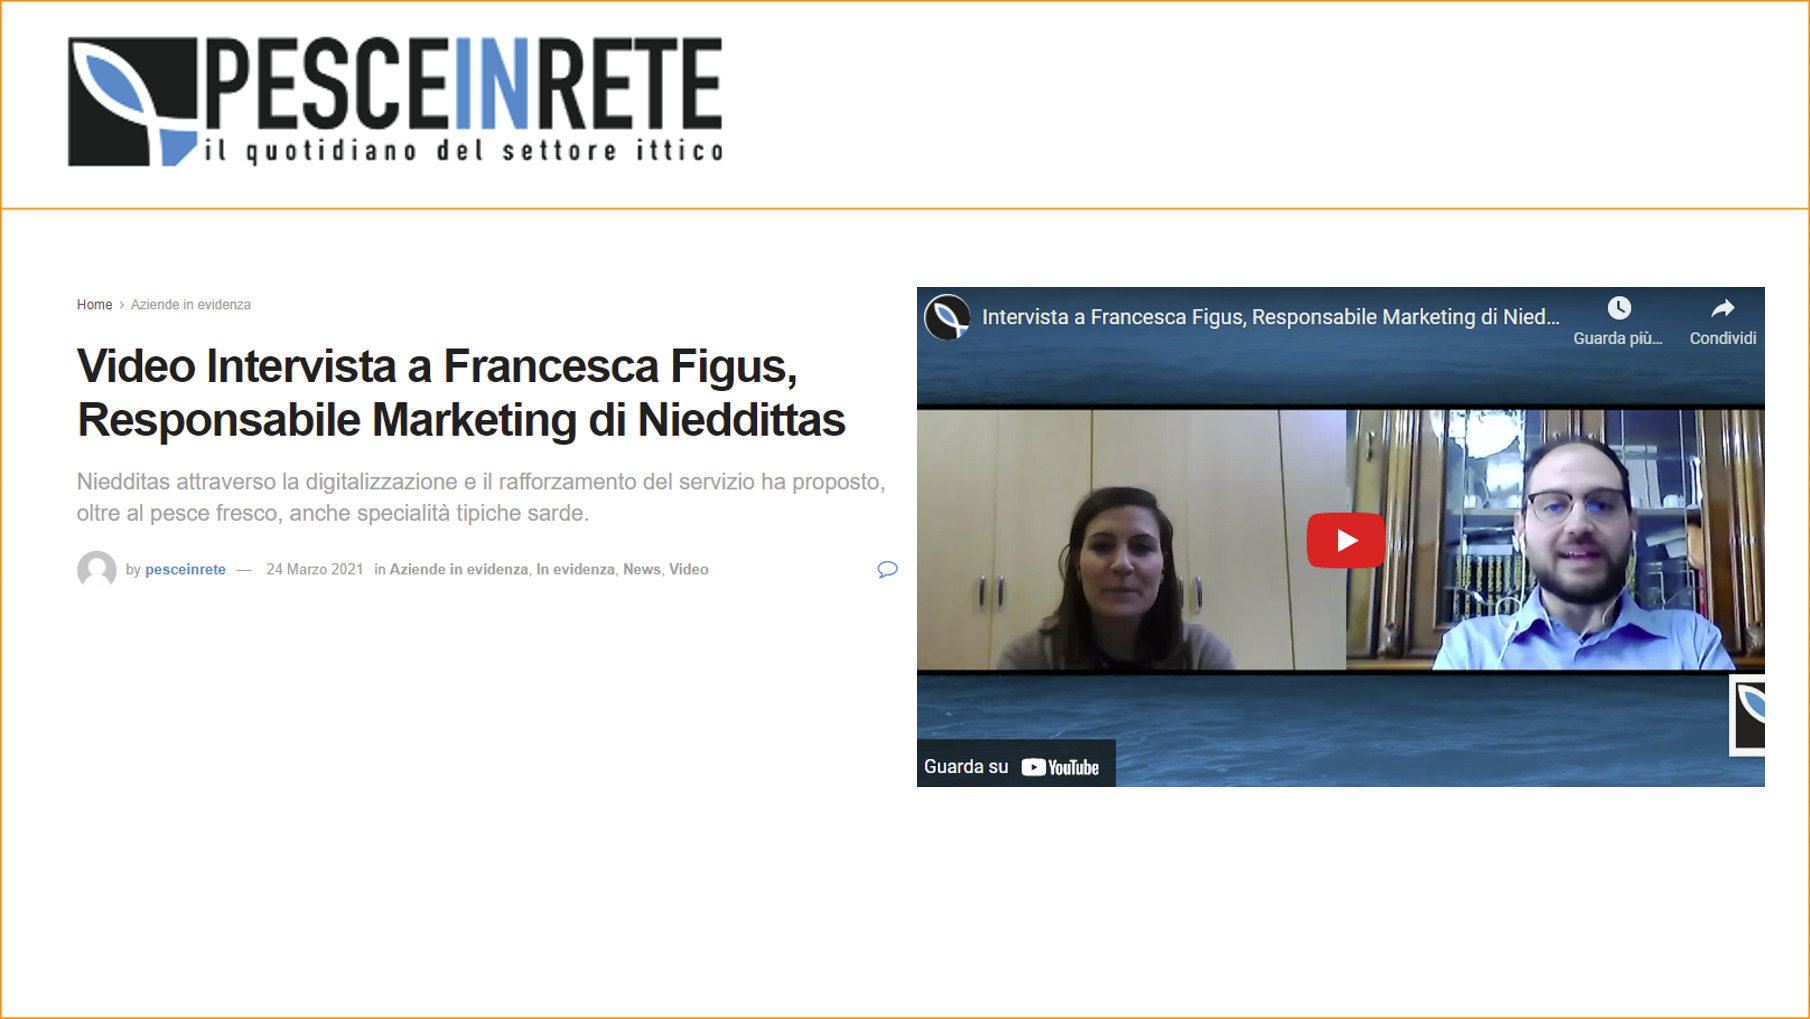 Video Intervista a Francesca Figus, Responsabile Marketing di Nieddittas